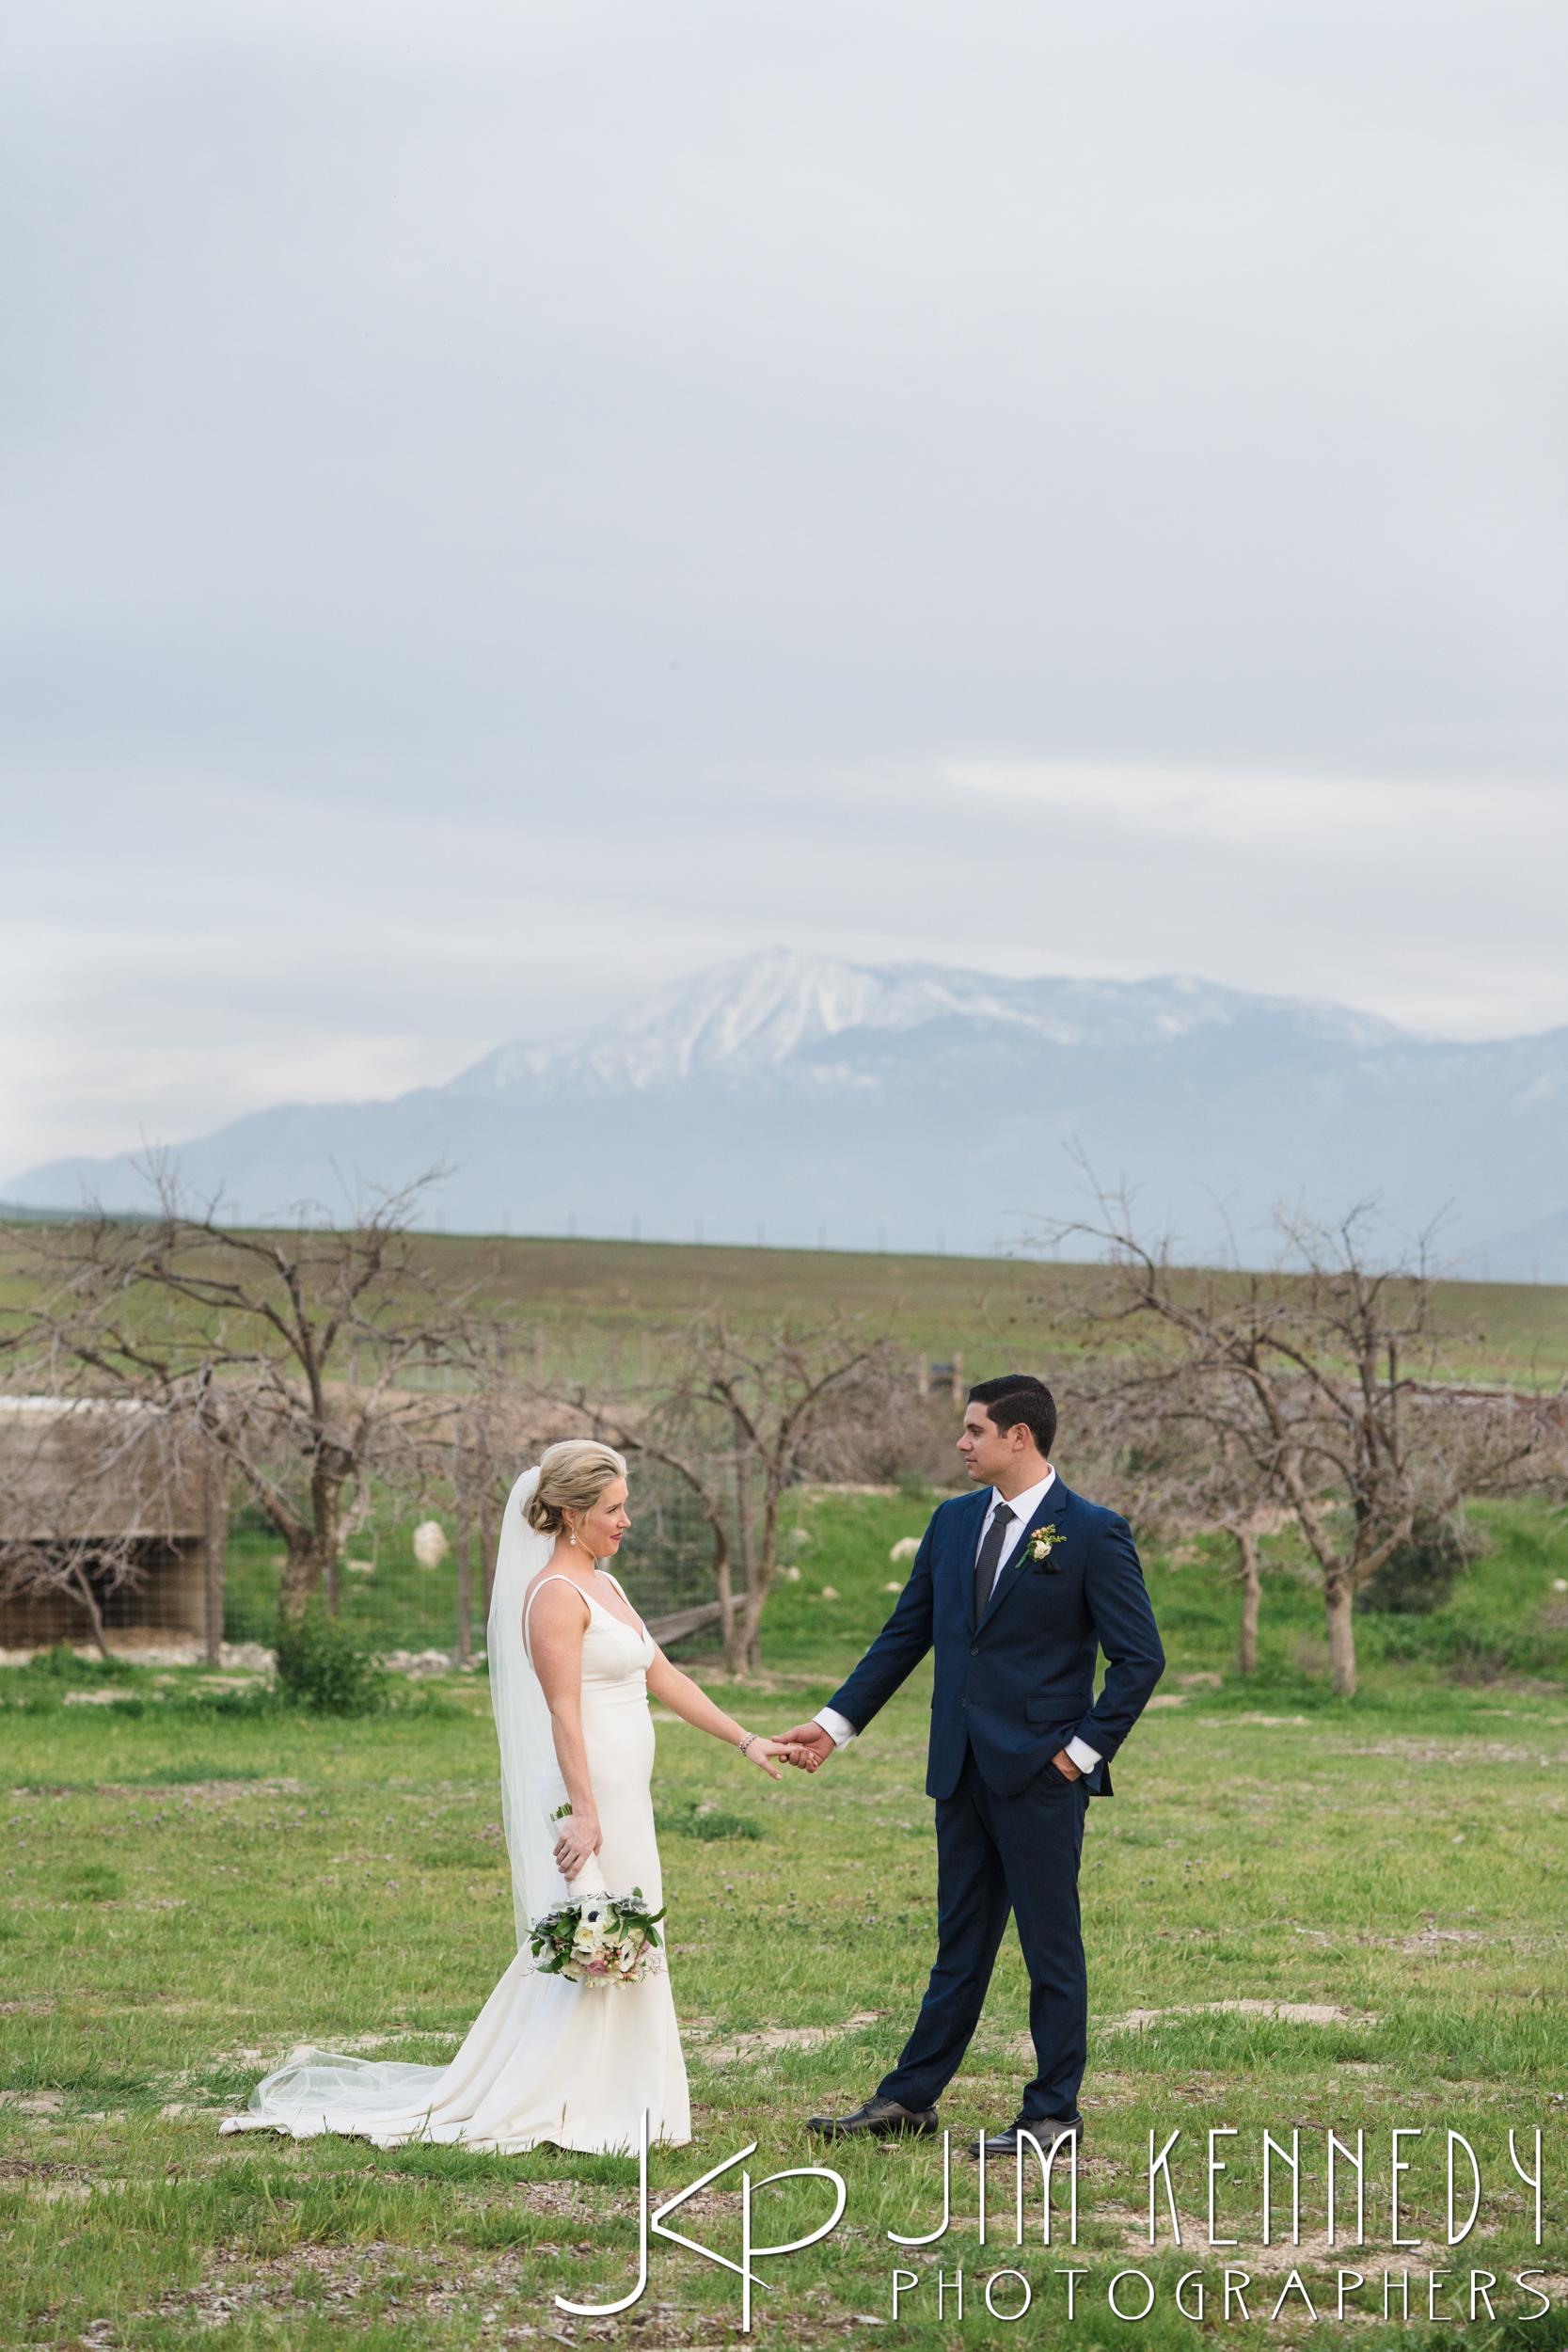 jim_kennedy_photographers_highland_springs_wedding_caitlyn_0140.jpg